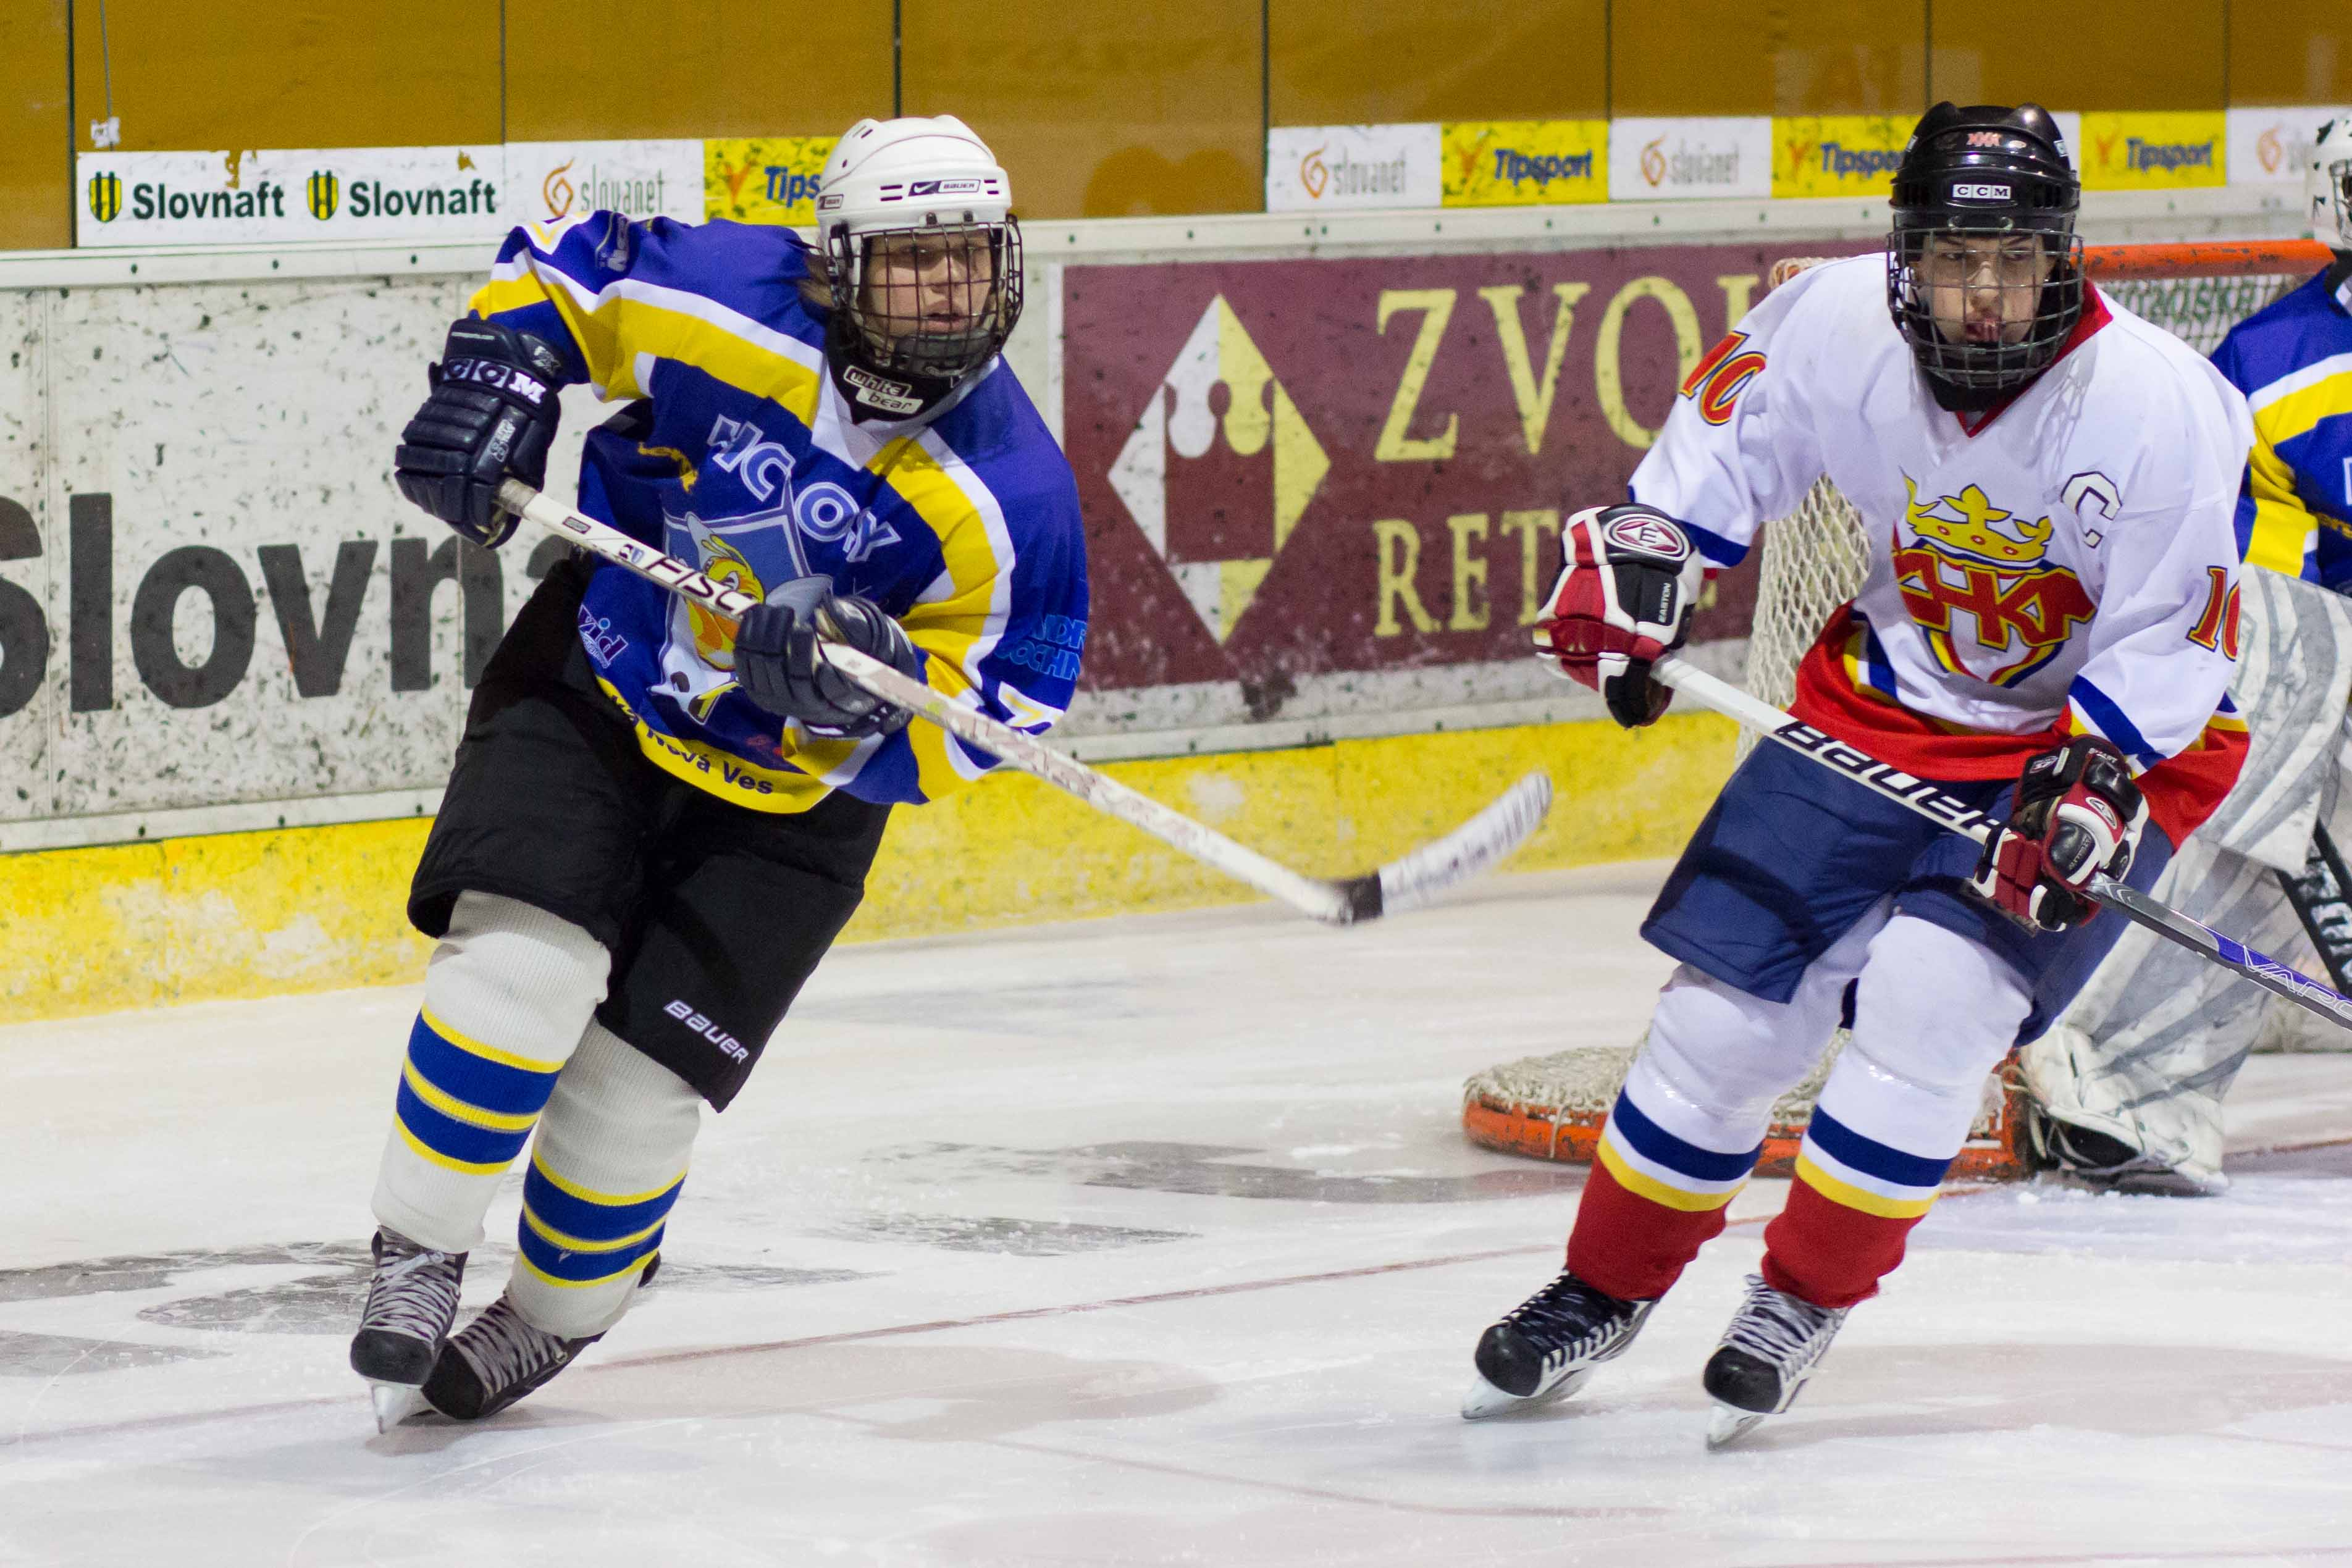 zhkm-zvolen-hc-spisska-n-ves-2013-hokej-9